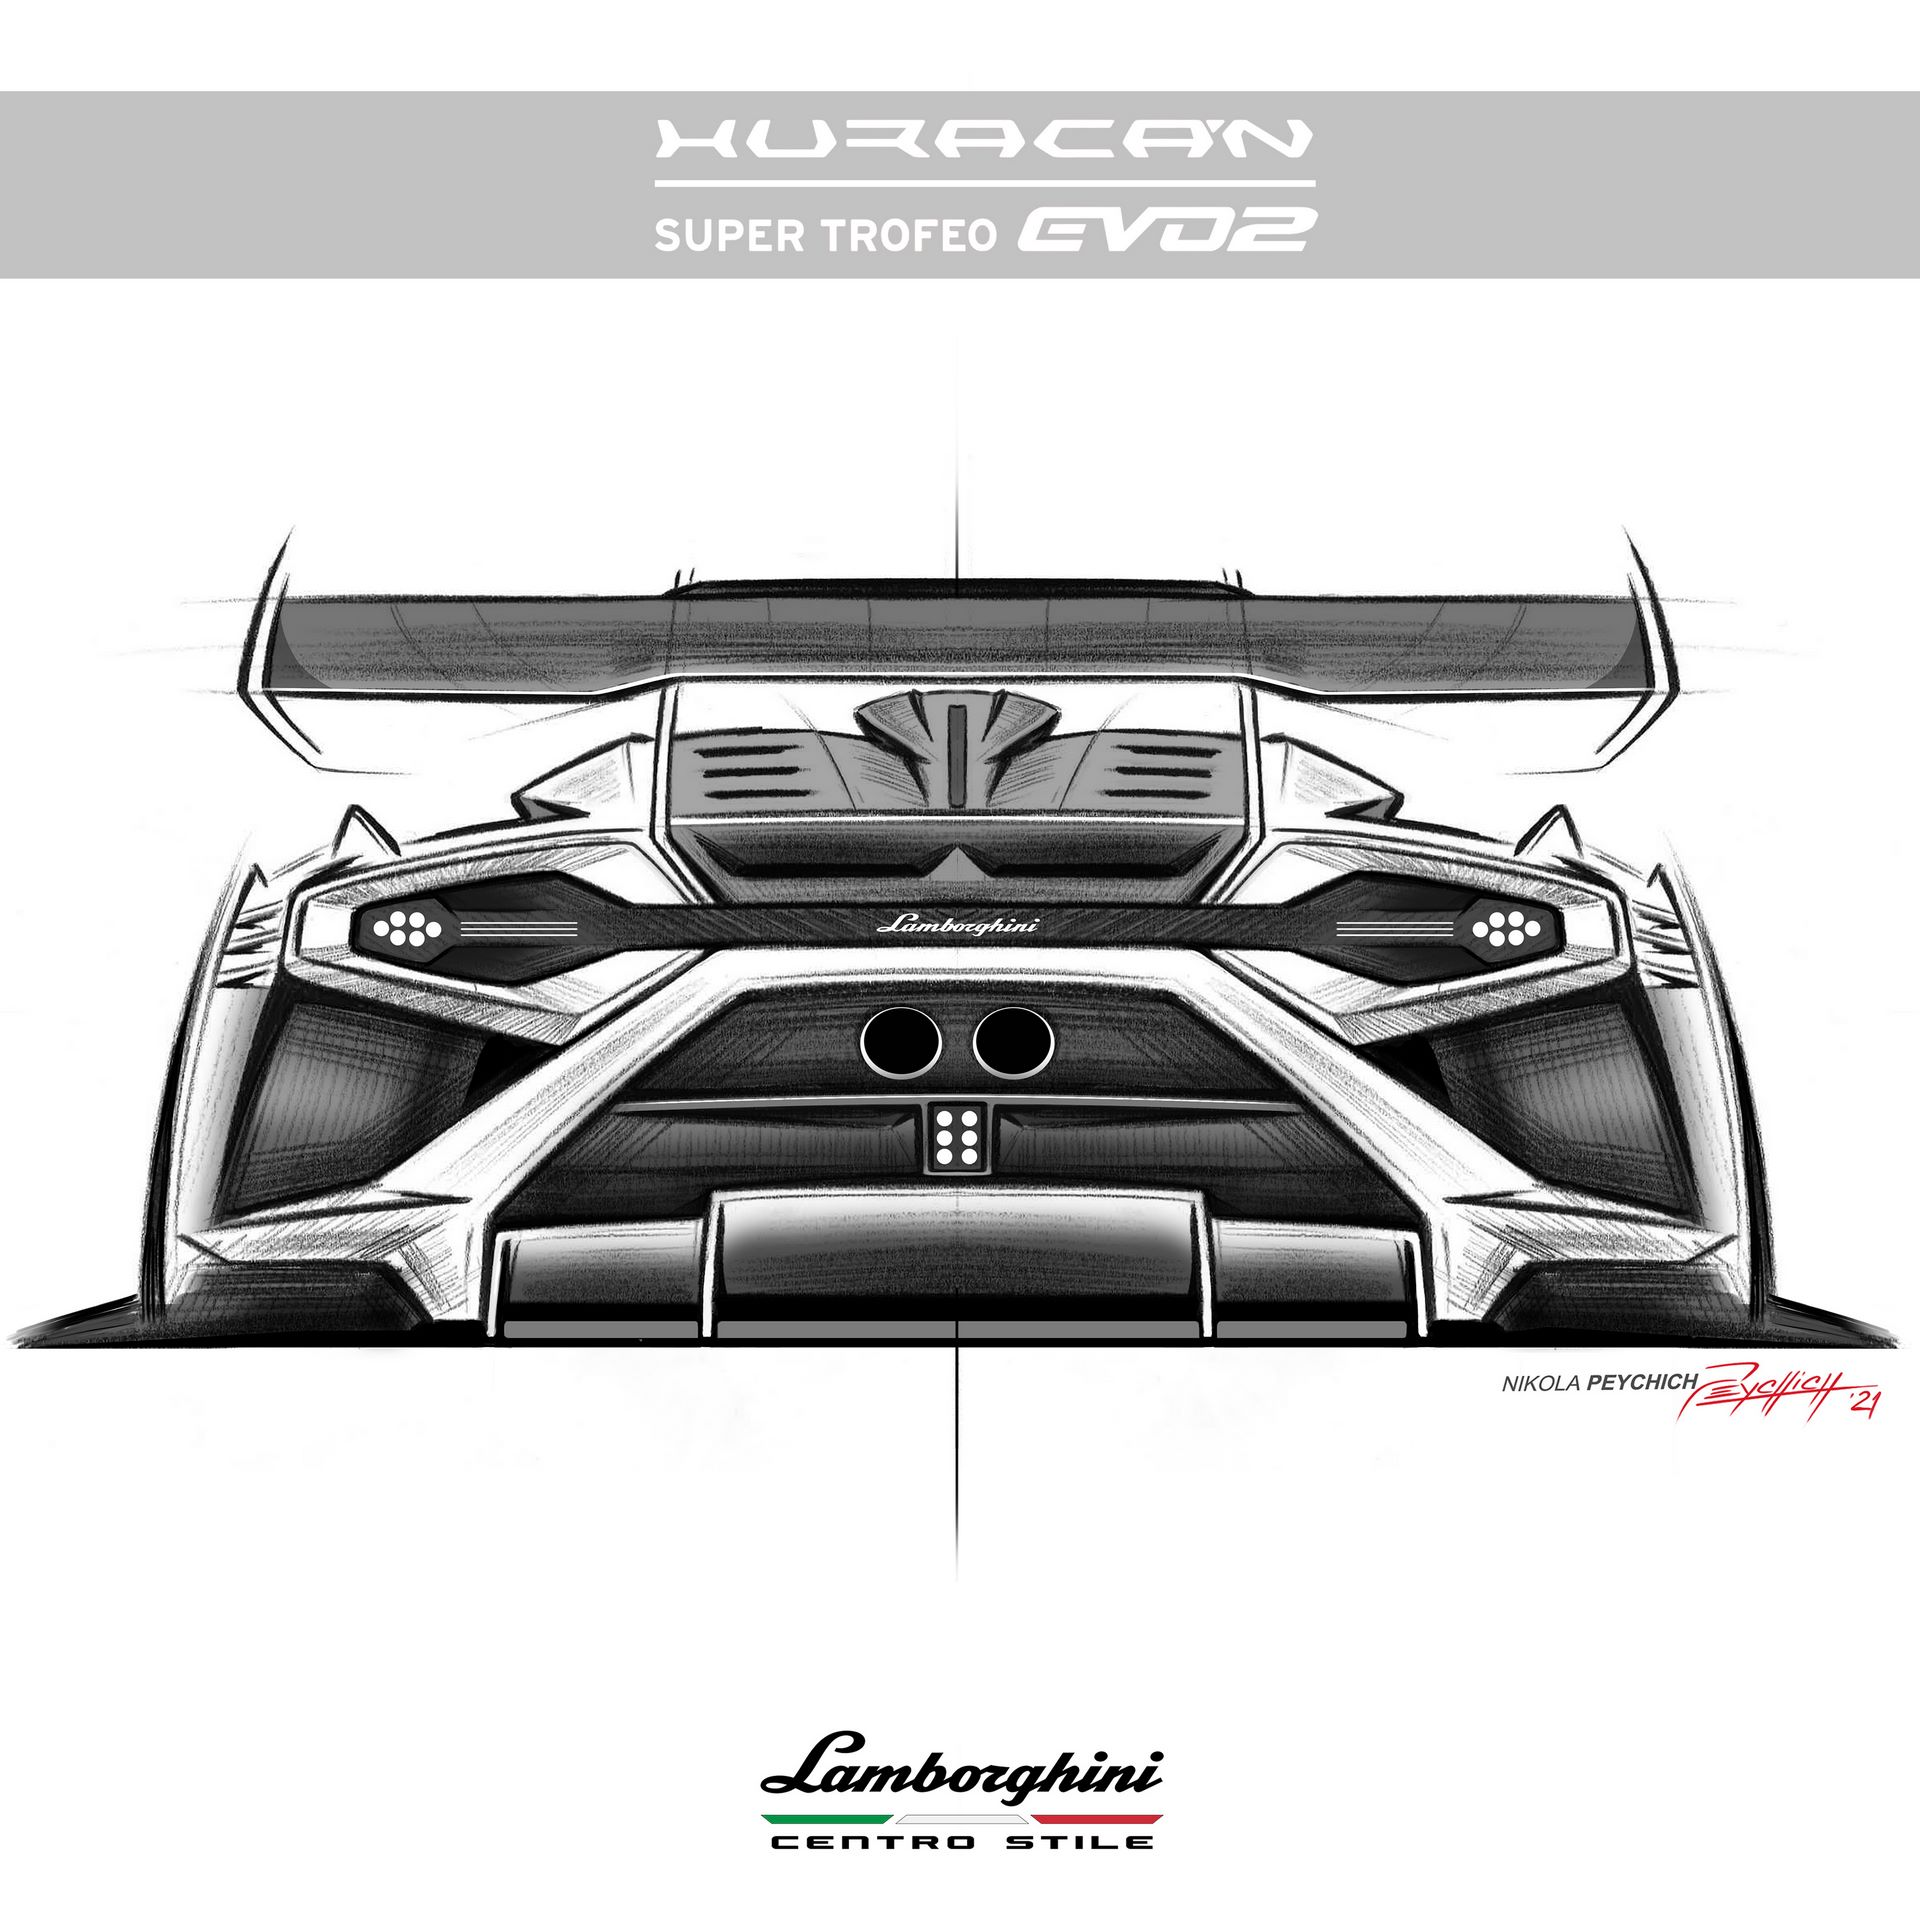 Lamborghini-Huracan-Super-Trofeo-EVO2-17